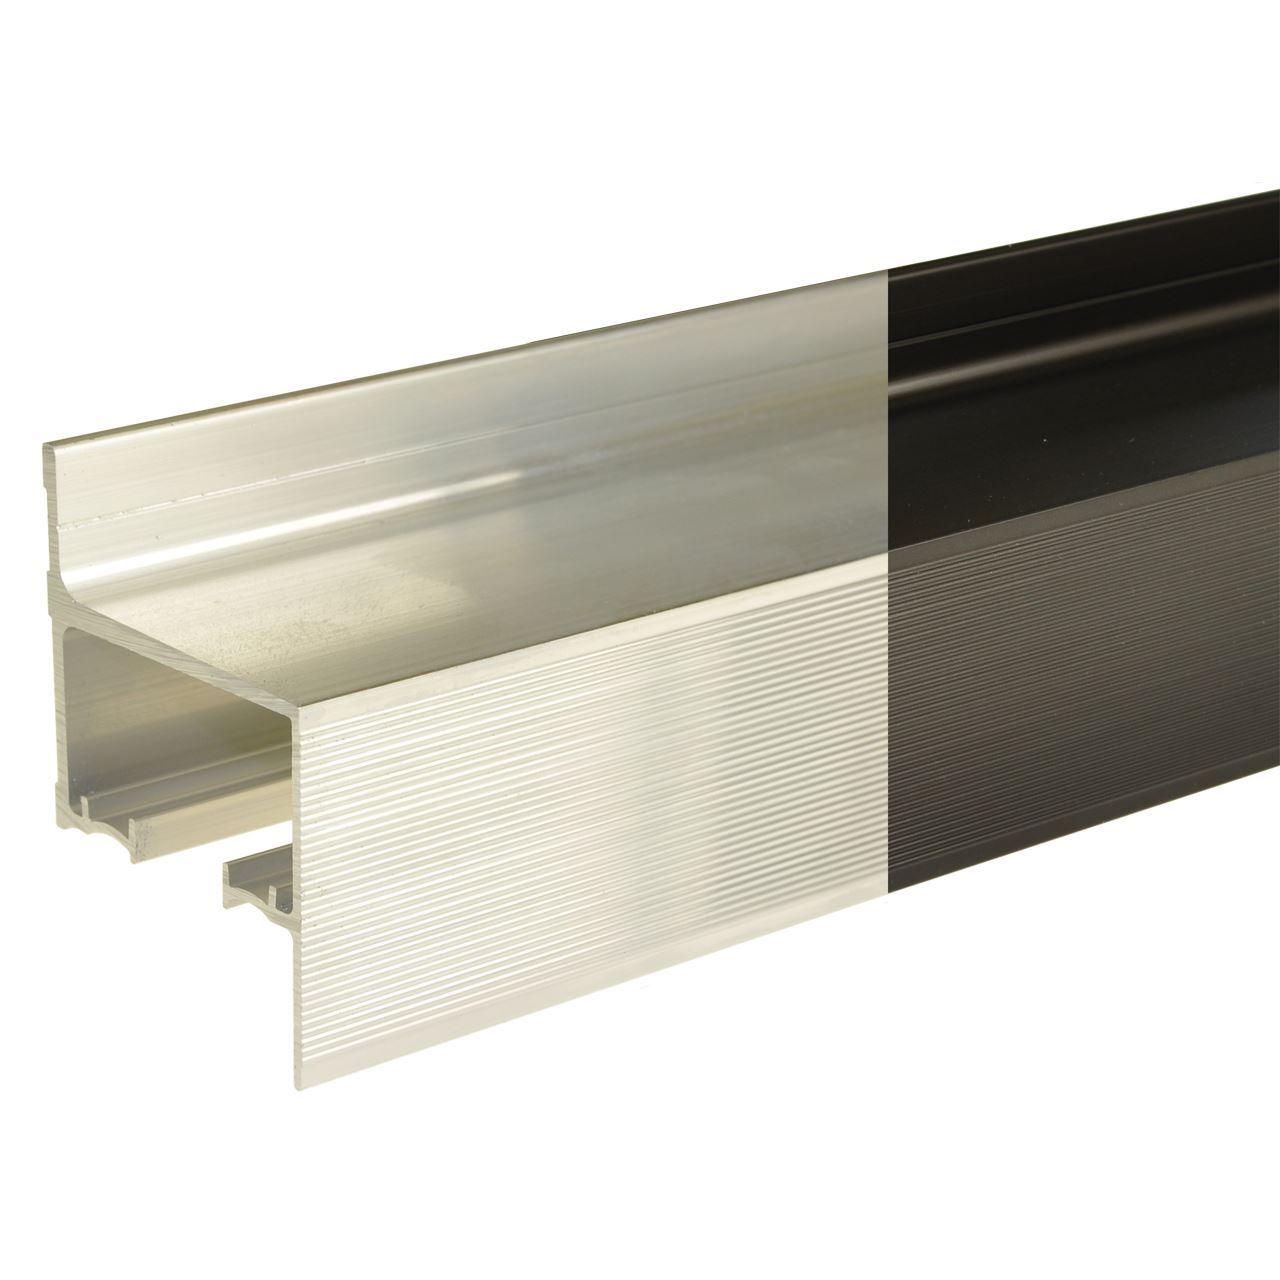 2610F Series Wall Mount Track. Johnsonhardware com Sliding Folding Pocket Door Hardware  Johnson